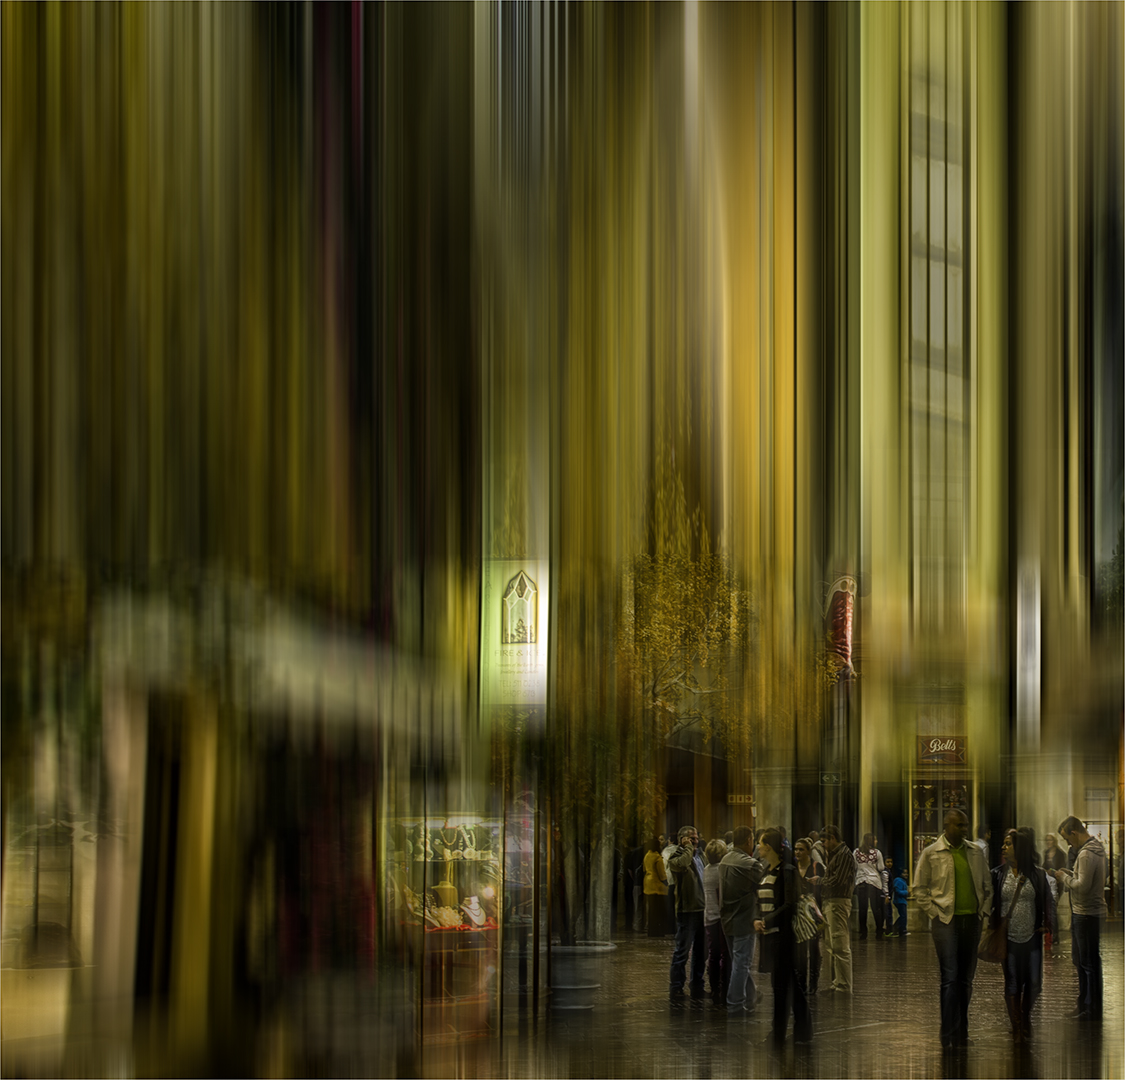 Shopping at night – Luzette Pizer